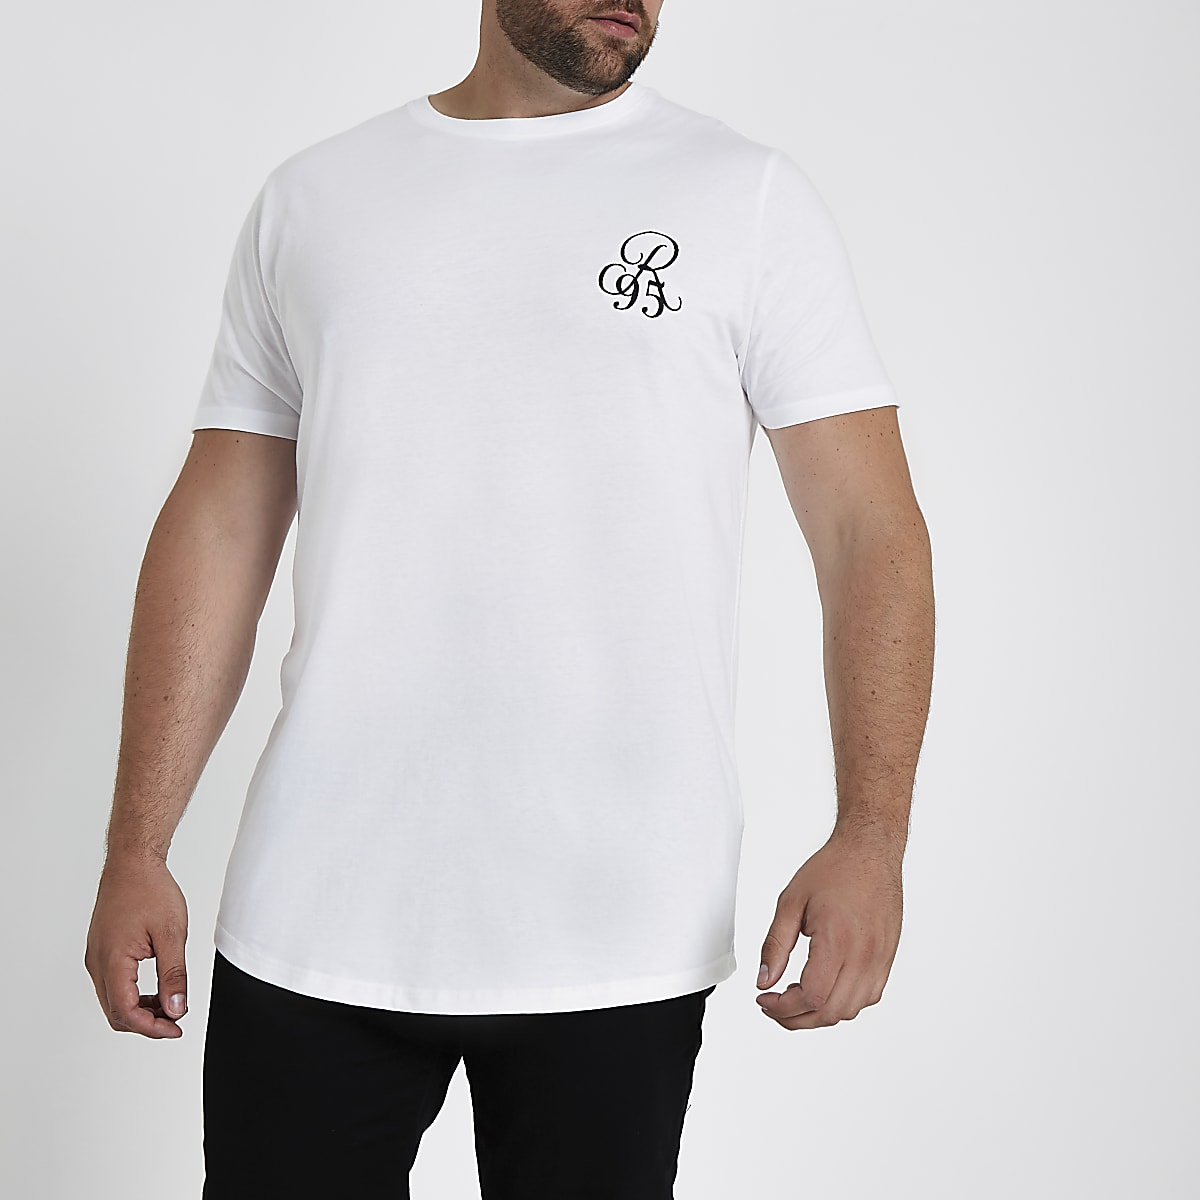 Big and Tall – T-shirt ajusté R96 blanc